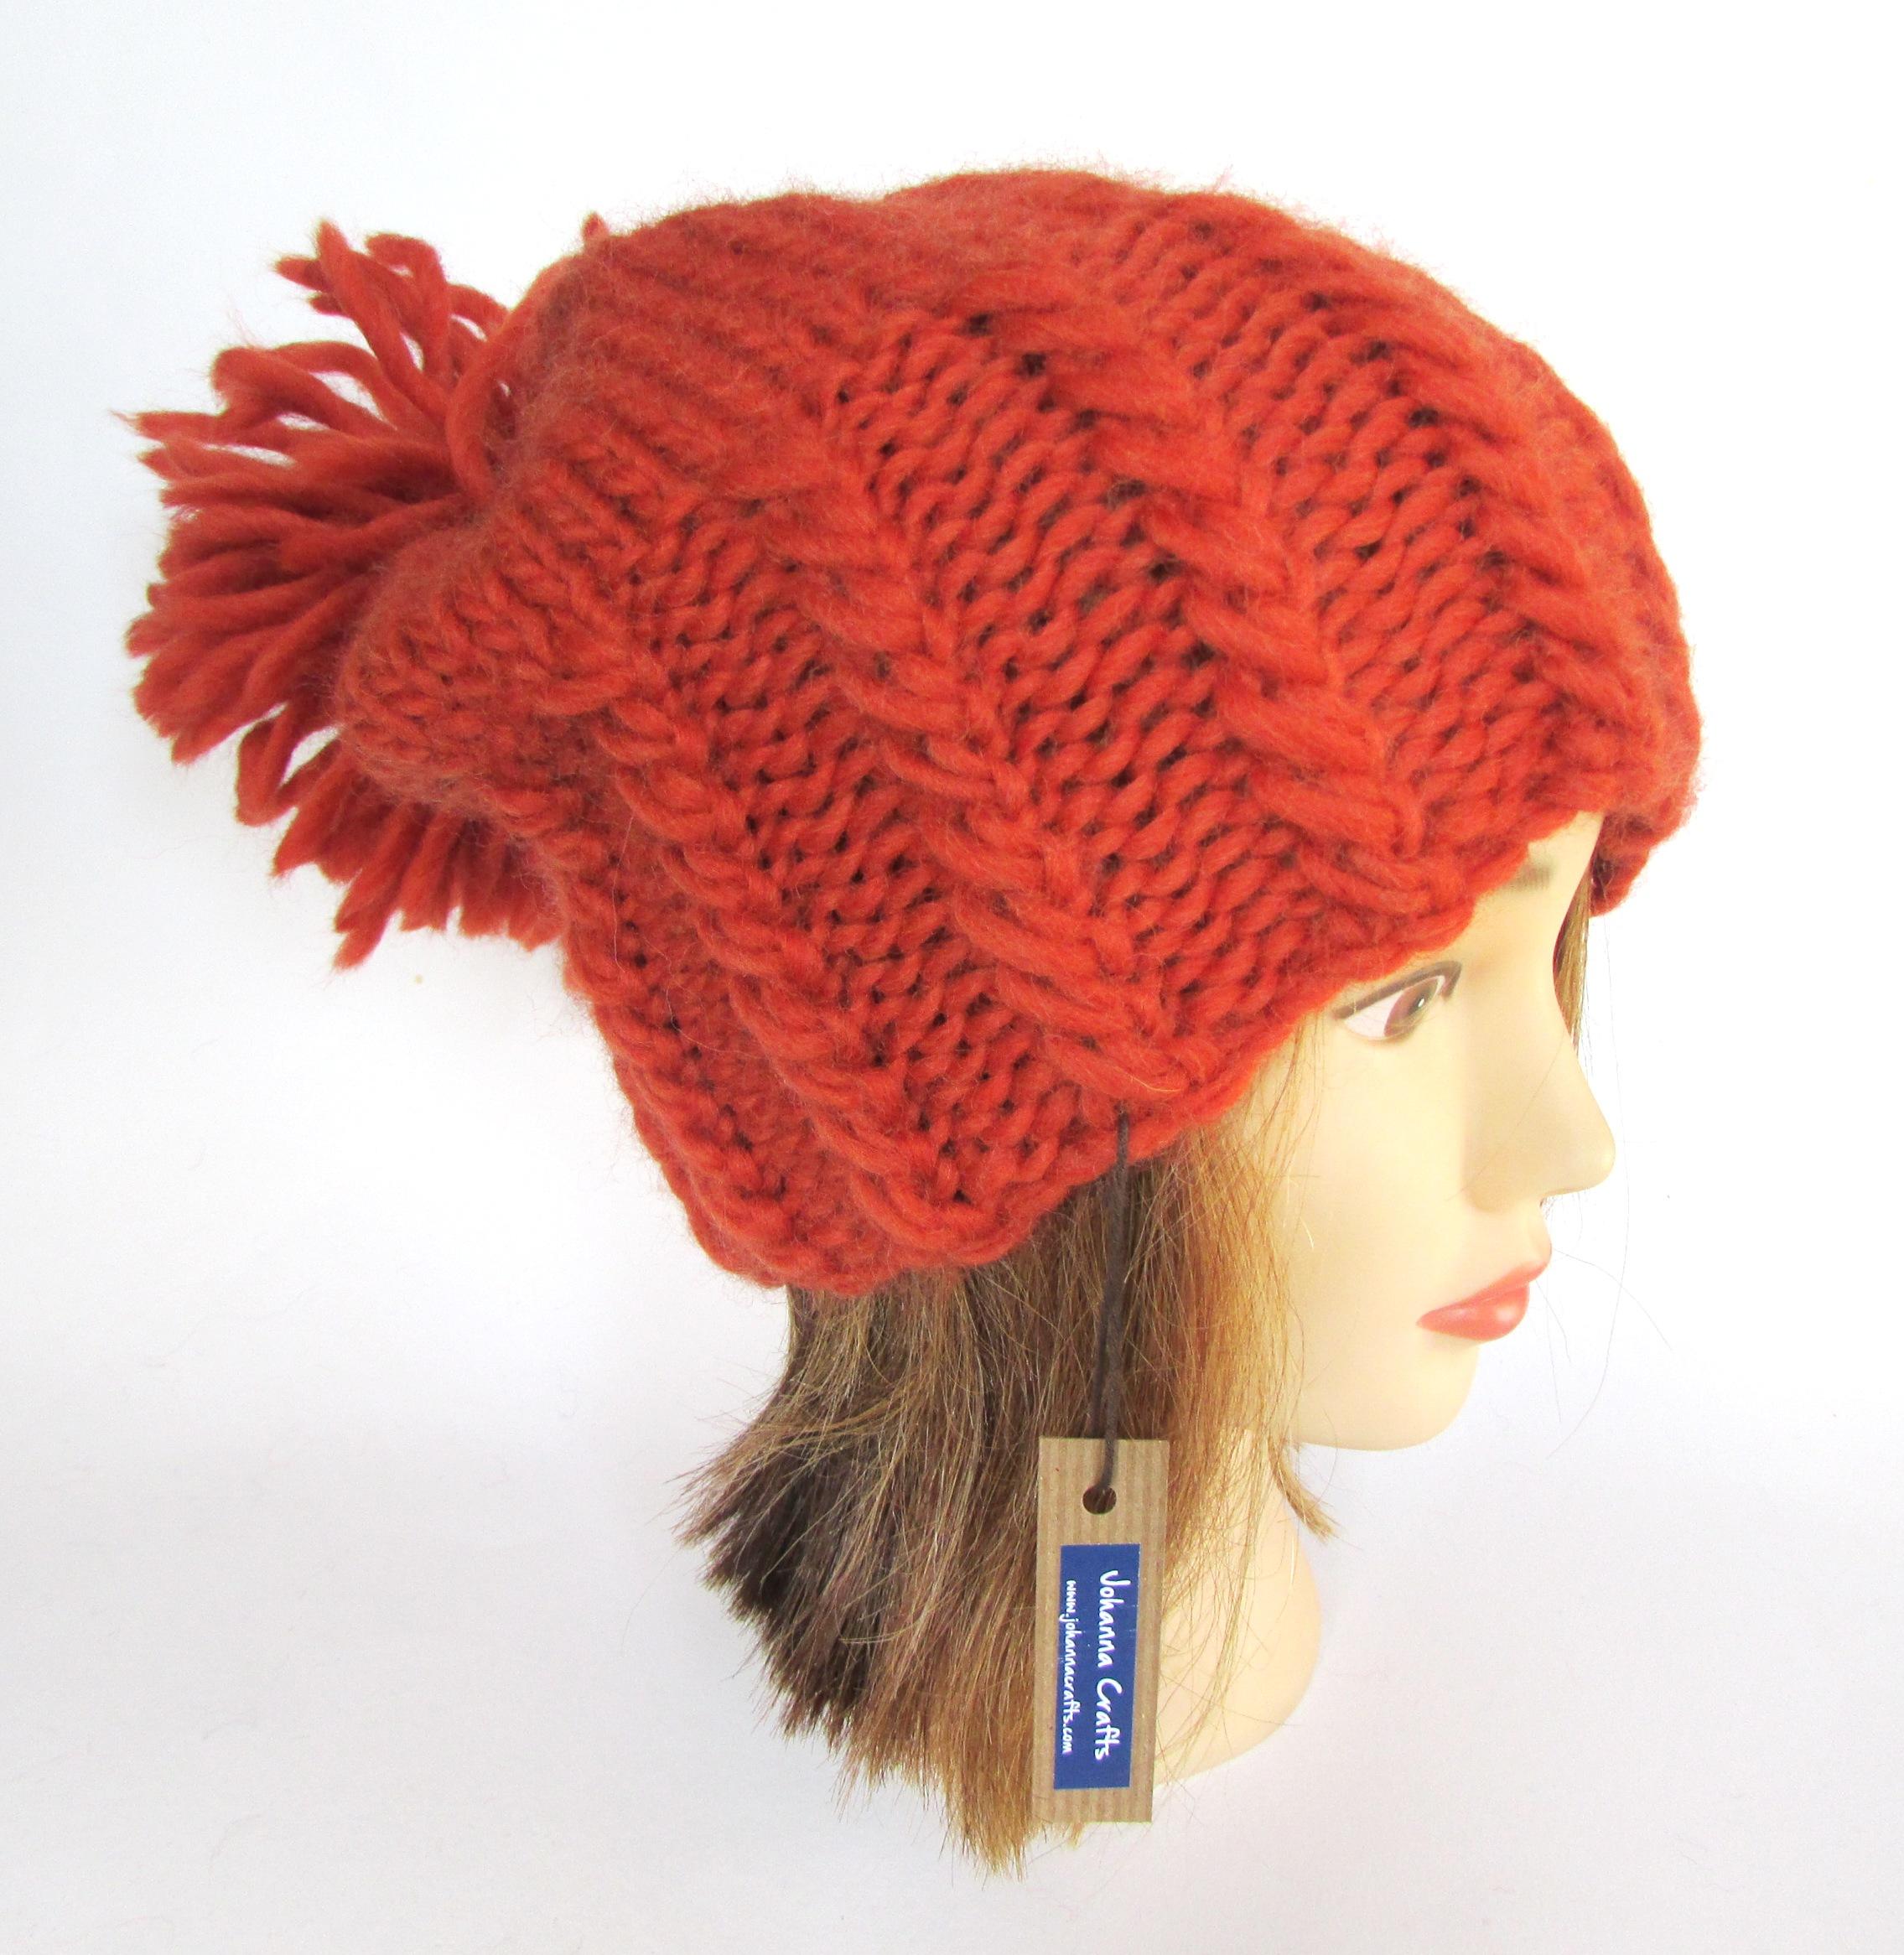 a269f0d0b Irish hand knit burnt orange hat with large pom pom - chunky knit fun  slouchy beanie hat - warm wool knit beanie - Irish knitwear by Johanna  Crafts